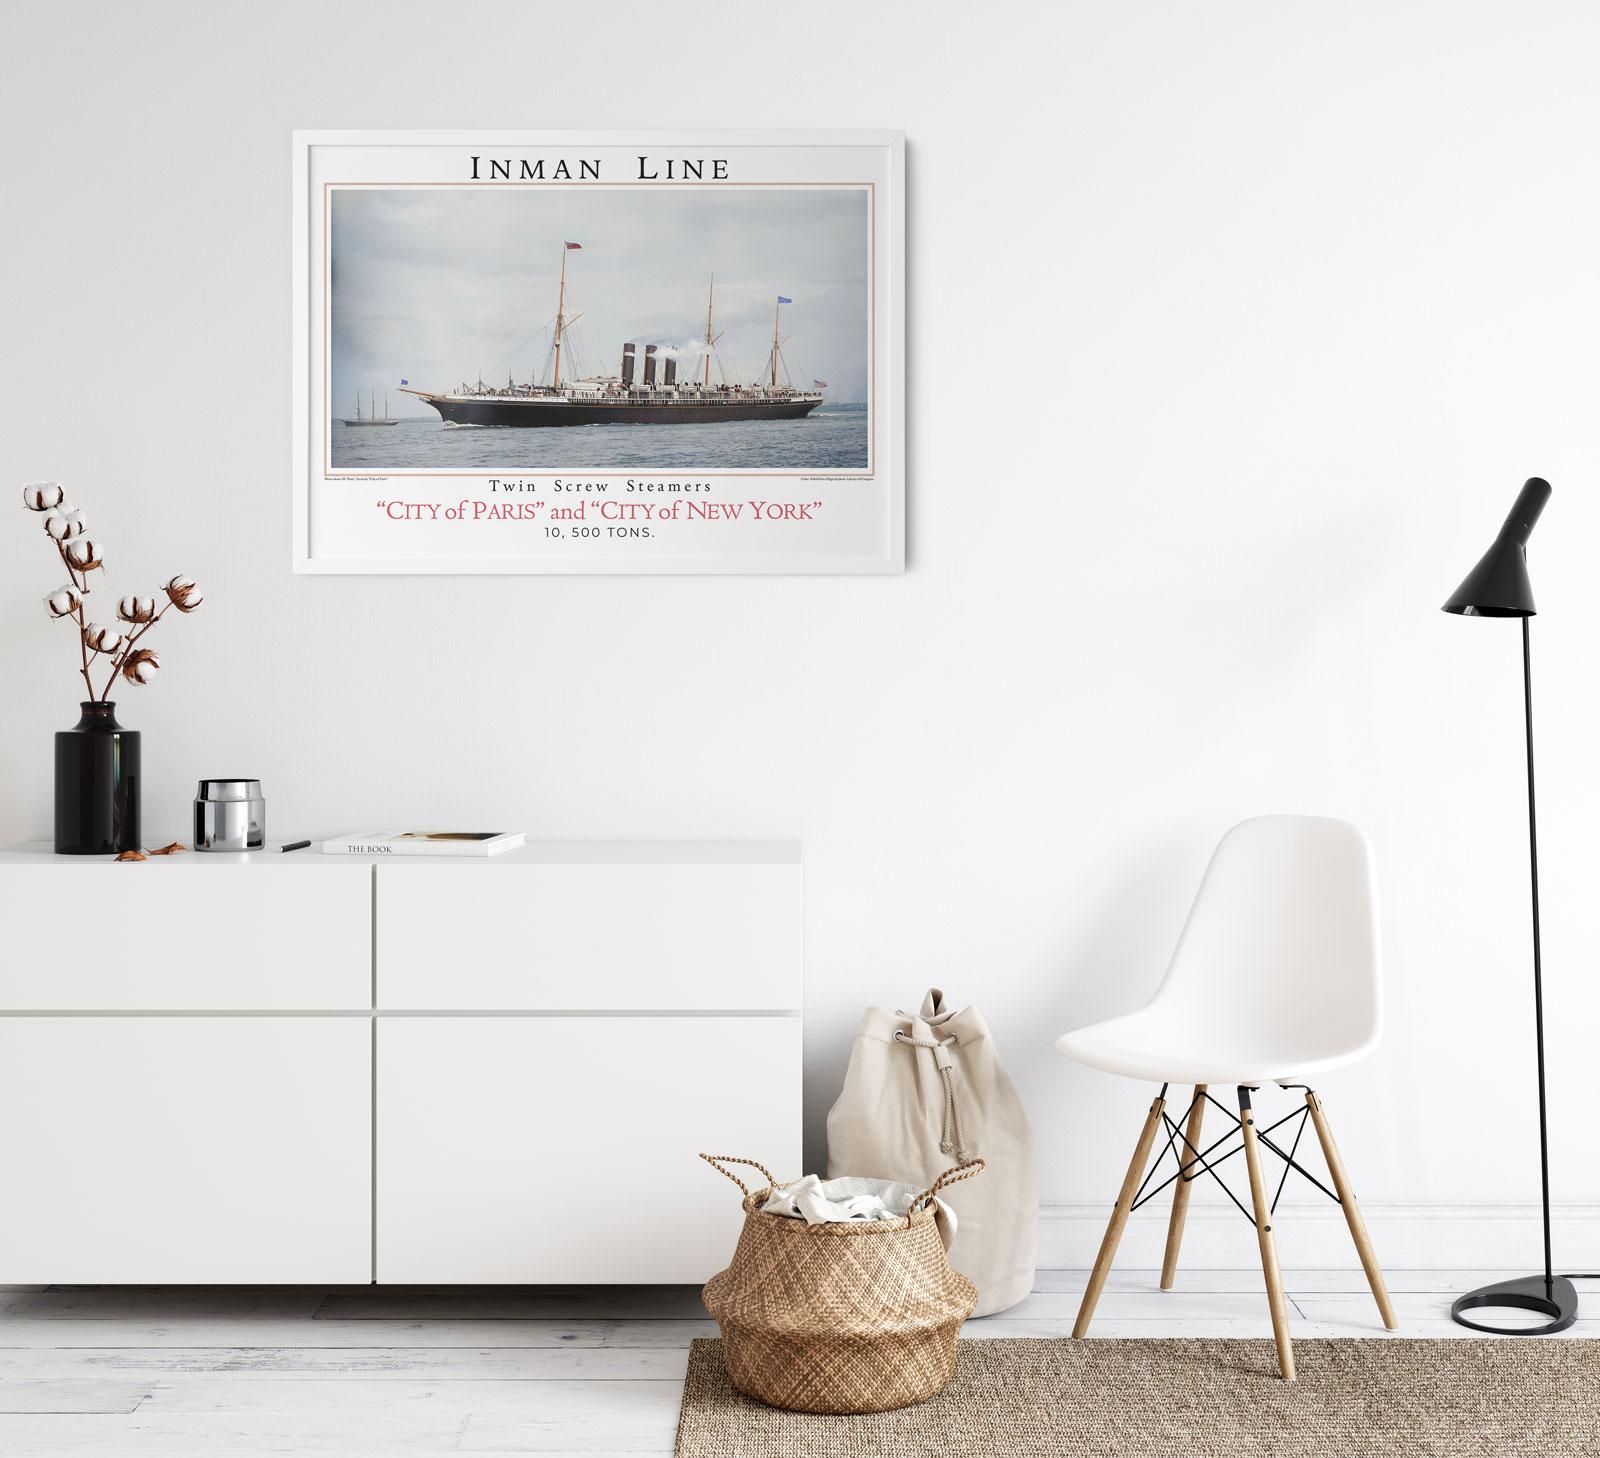 Inman Line (Poster)